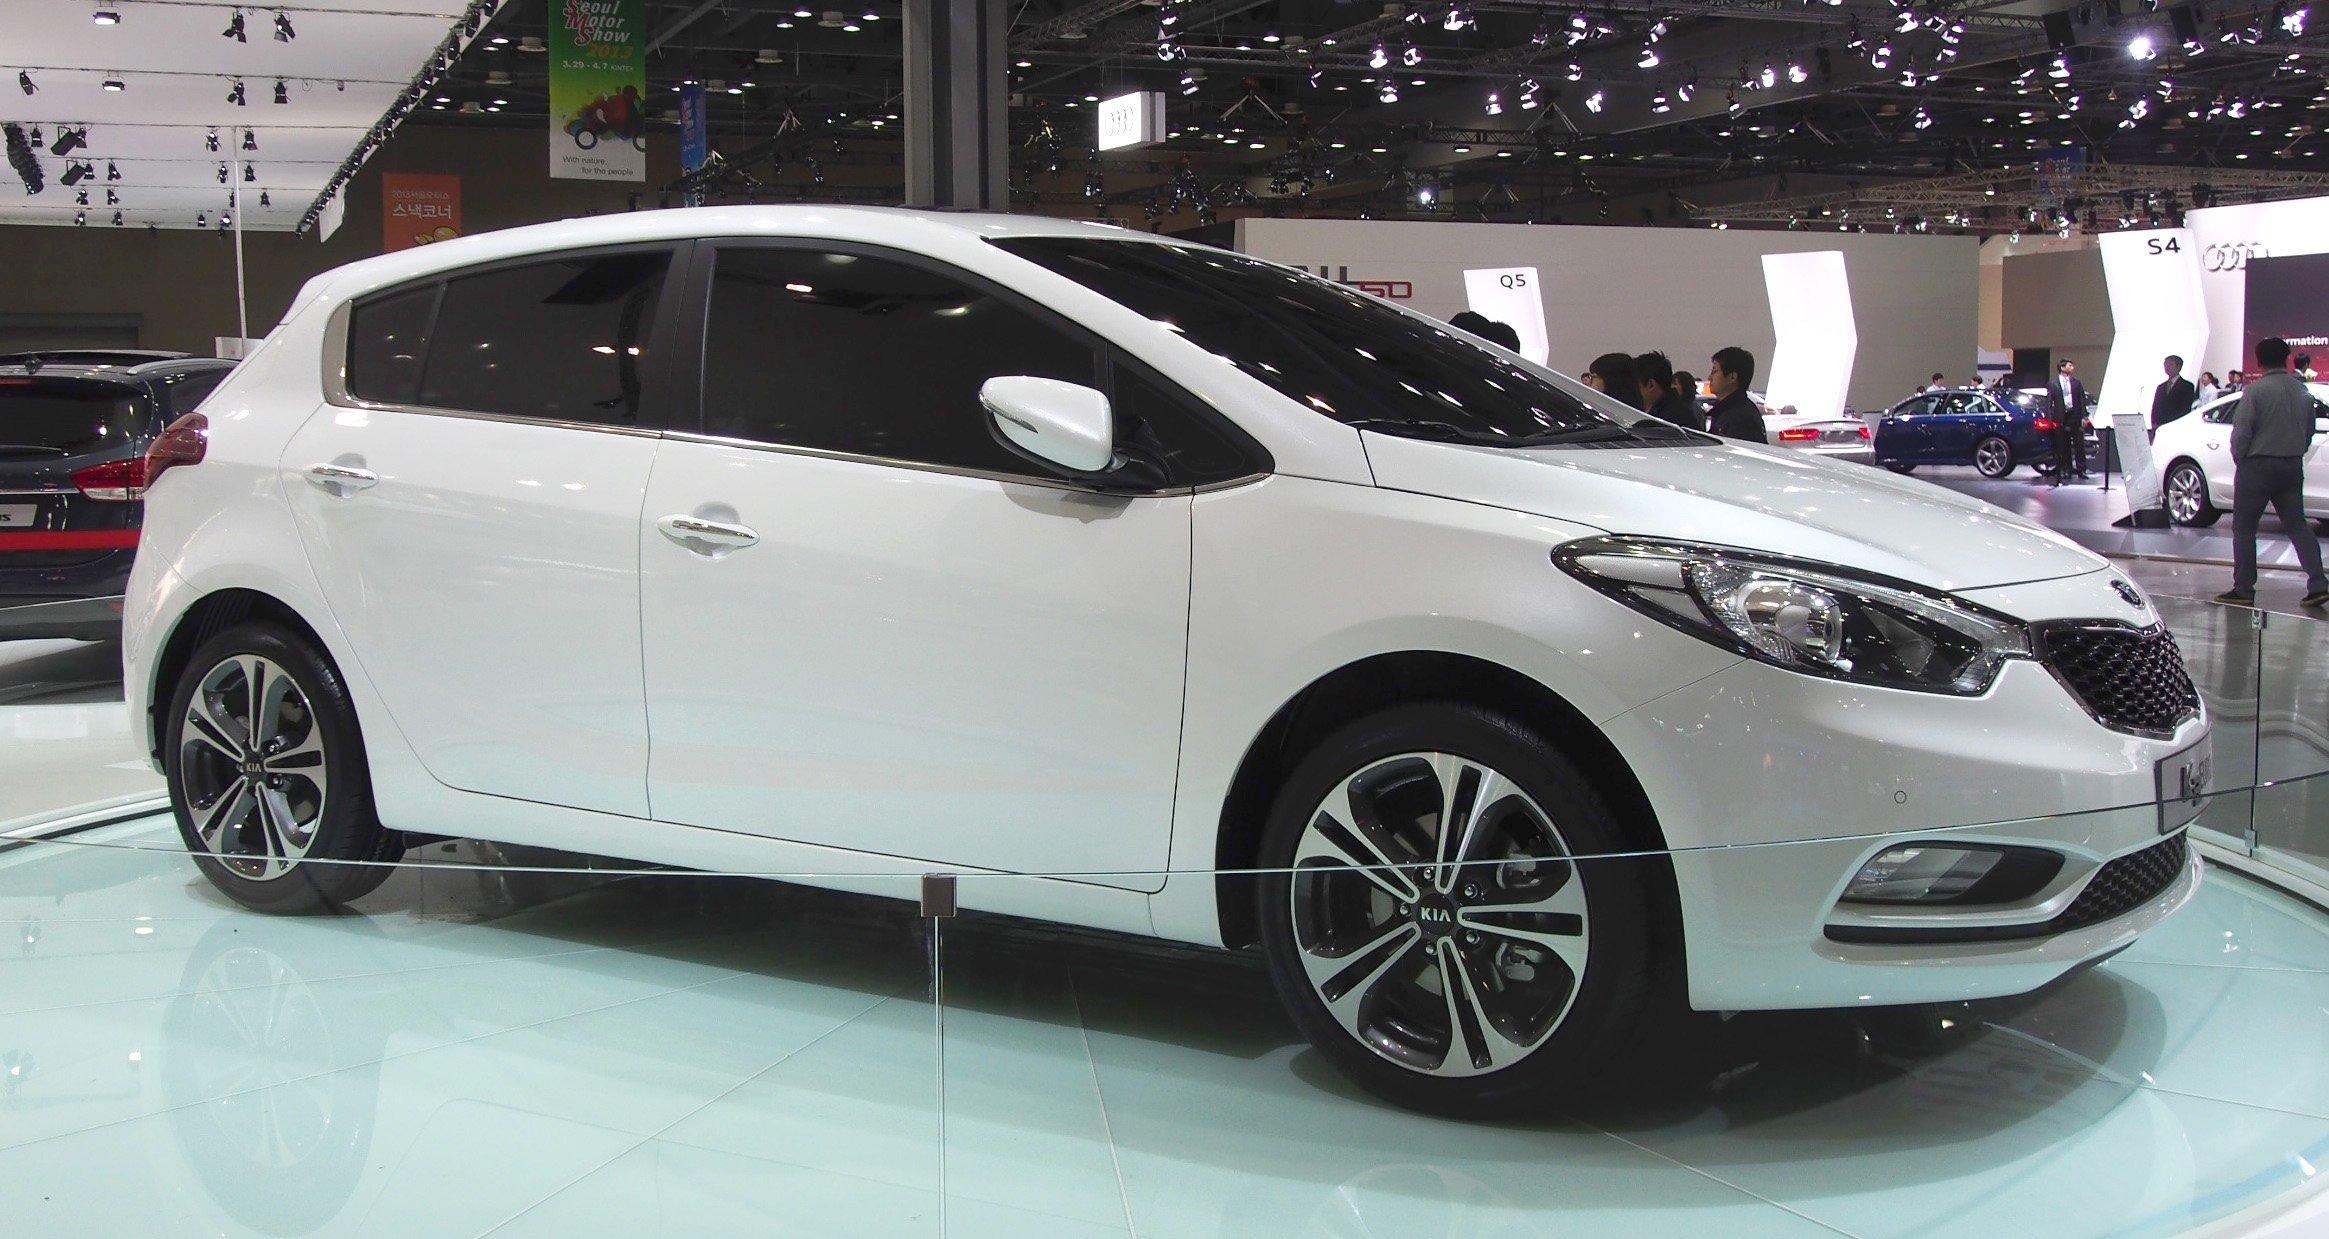 Kia Forte Hatchback >> Kia Forte hatchback is called the K3 Euro in Korea Paul Tan - Image 165288